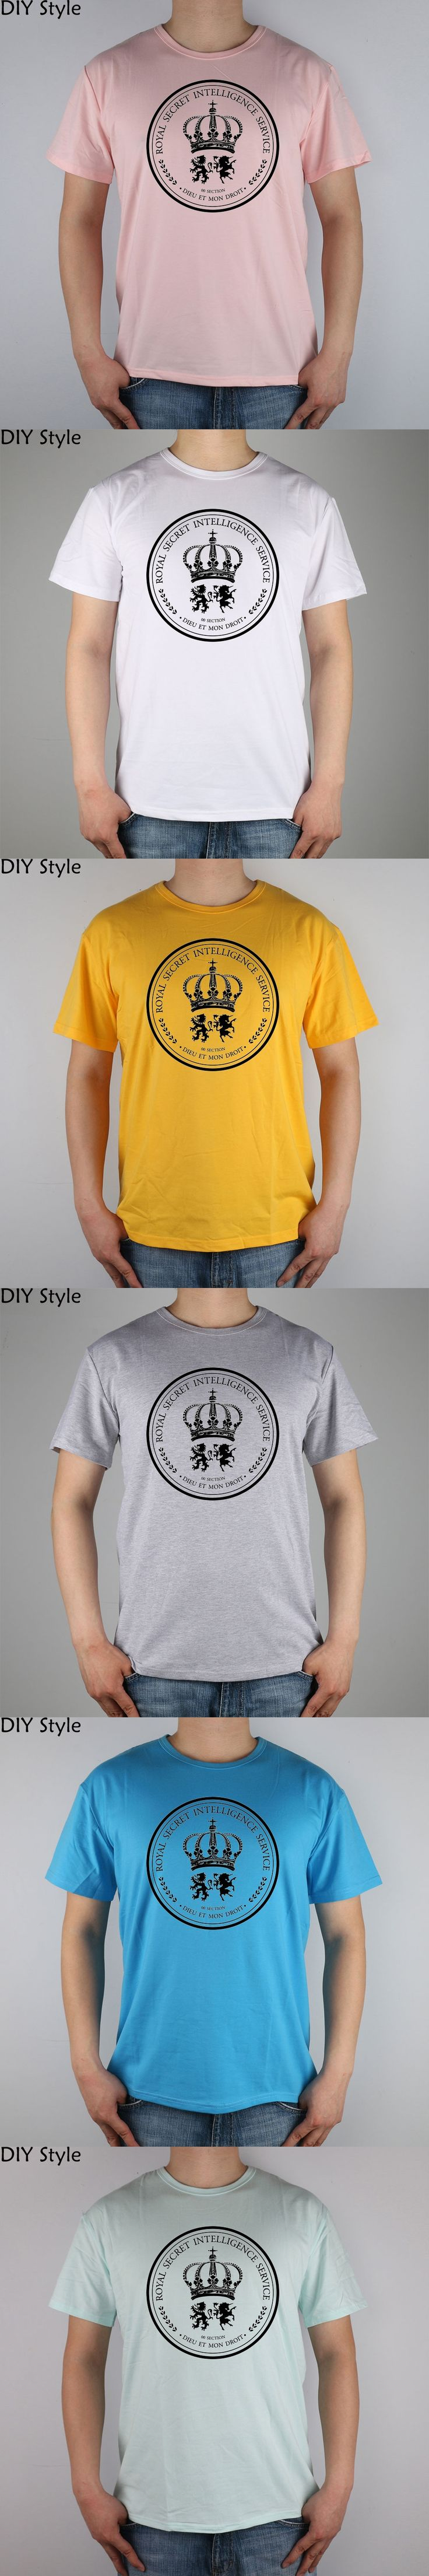 Mi6 Secret Intelligence James Bond Men Short Sleeve t-shirt New Arrival Fashion Brand T Shirt